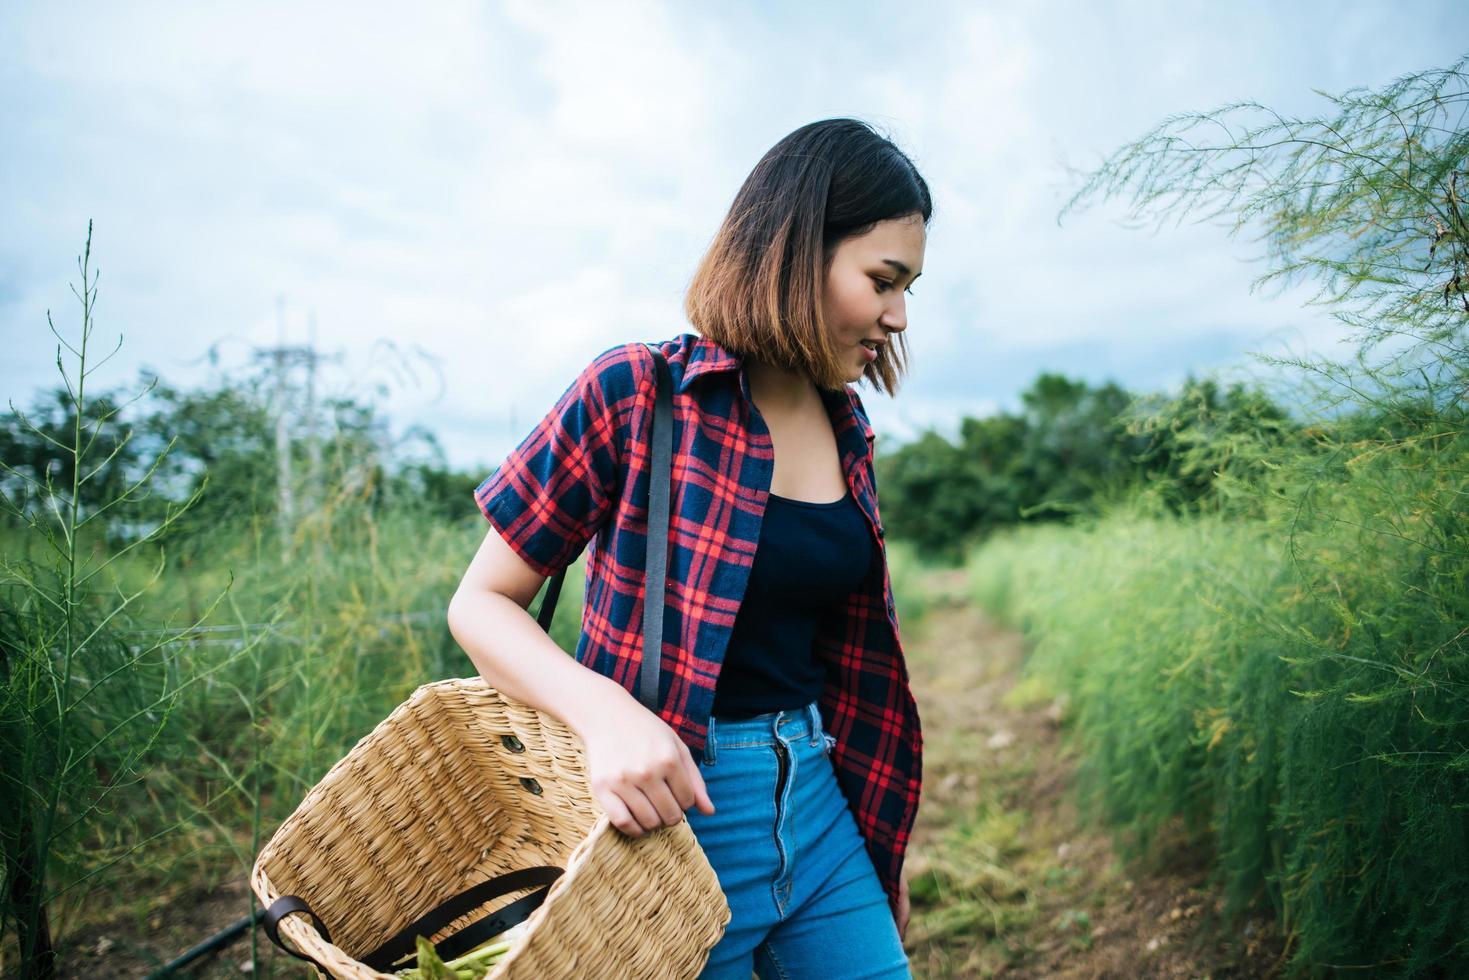 giovane agricoltore che raccoglie asparagi freschi foto